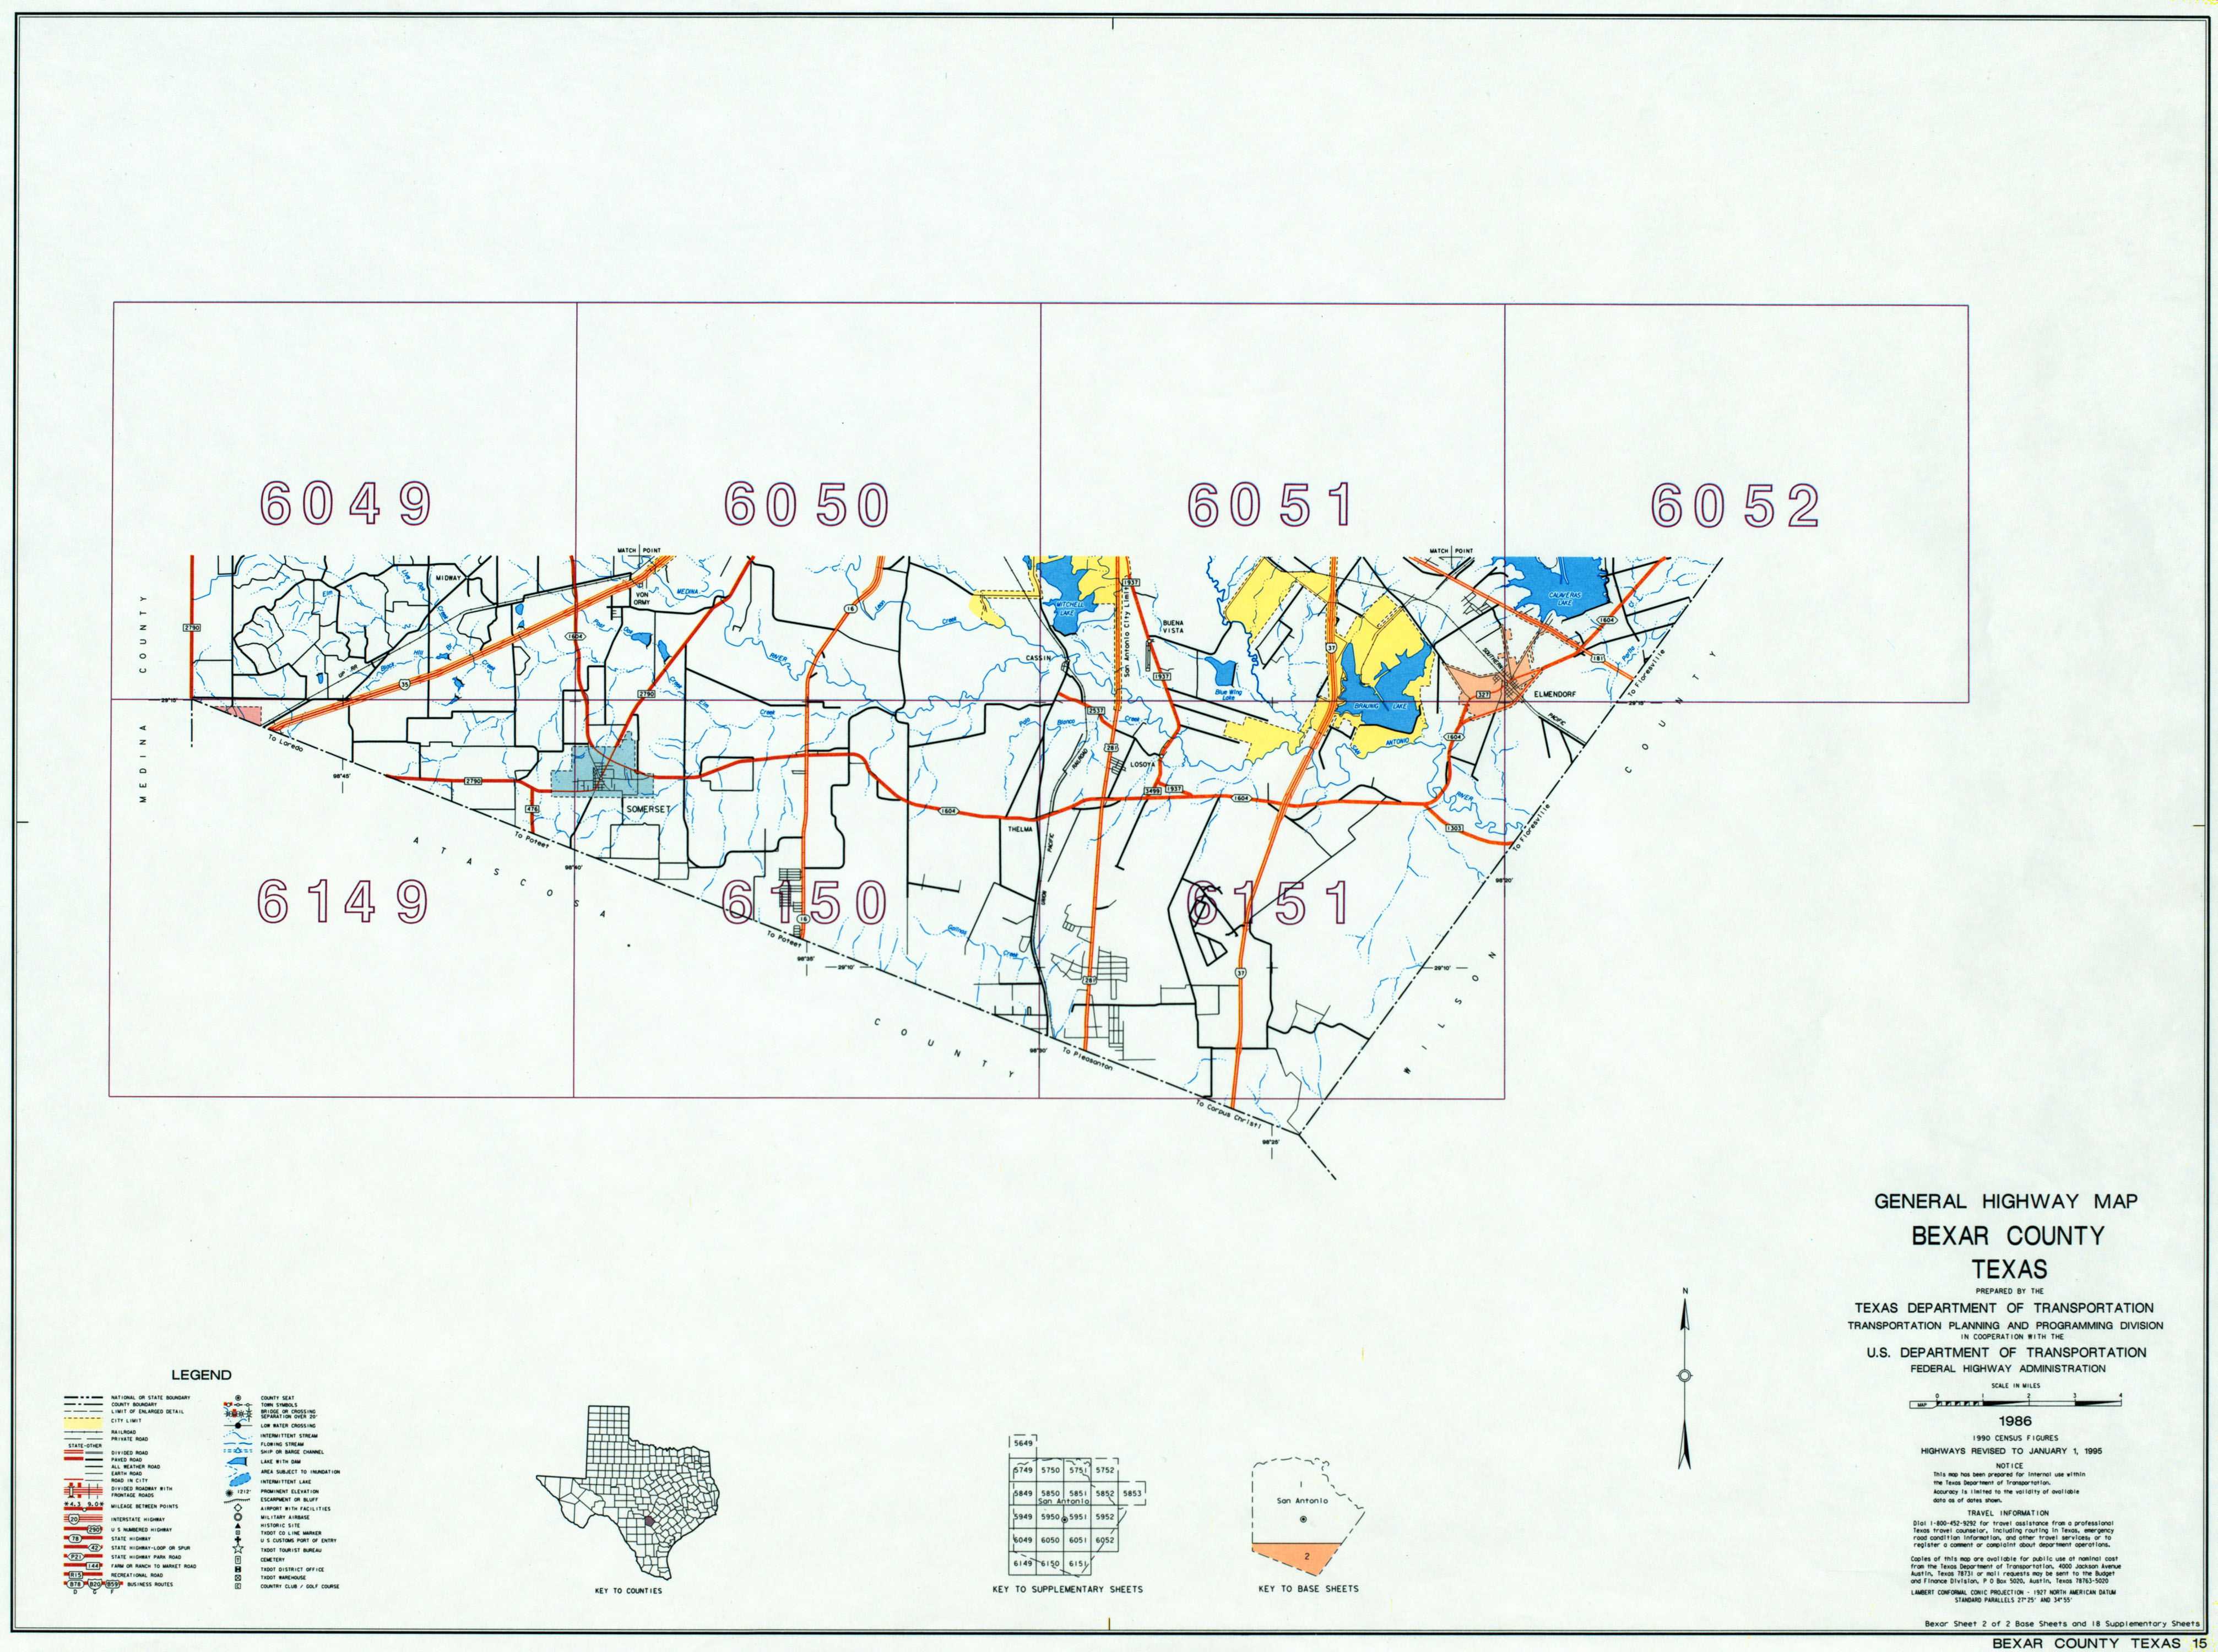 Texas County Highway Maps Browse Perry Castaeda Map Collection Jacinto 6 Block Diagram Bexar 15 Base Sheet 2